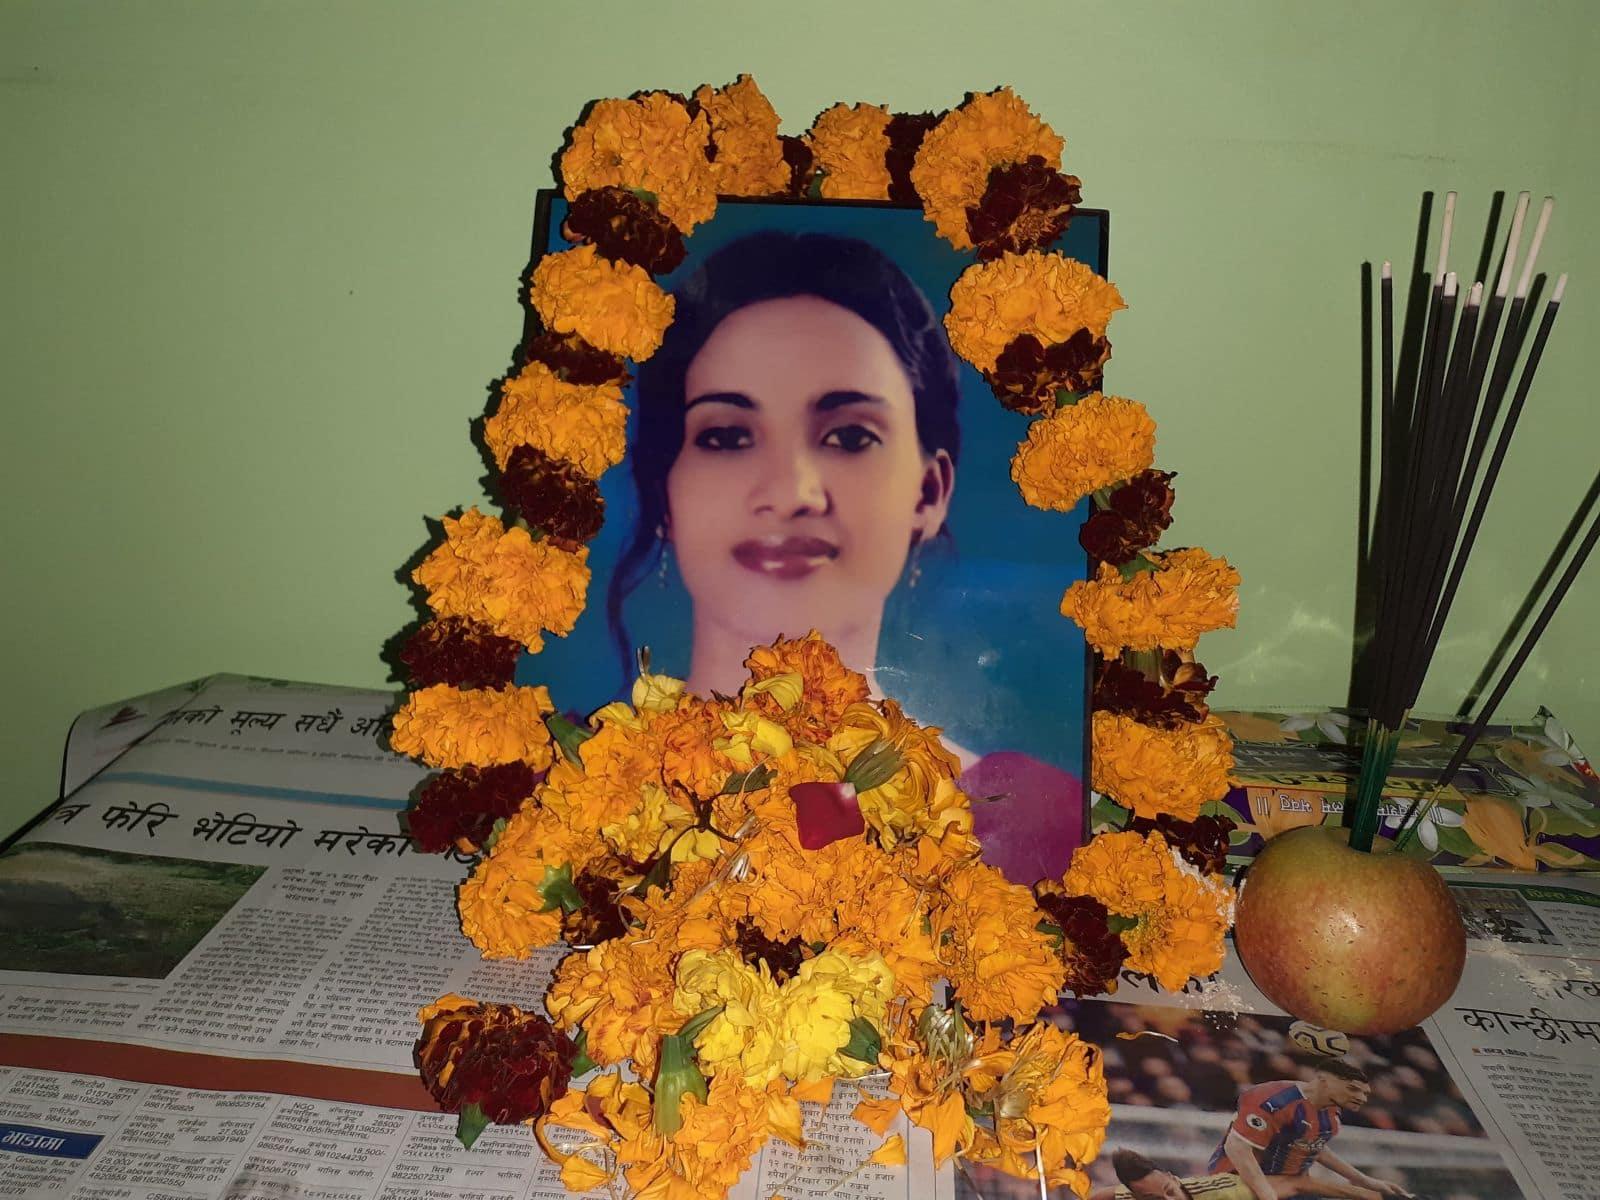 पत्रकार सिंहको १२ औँ स्मृति दिवस मनाइँदै